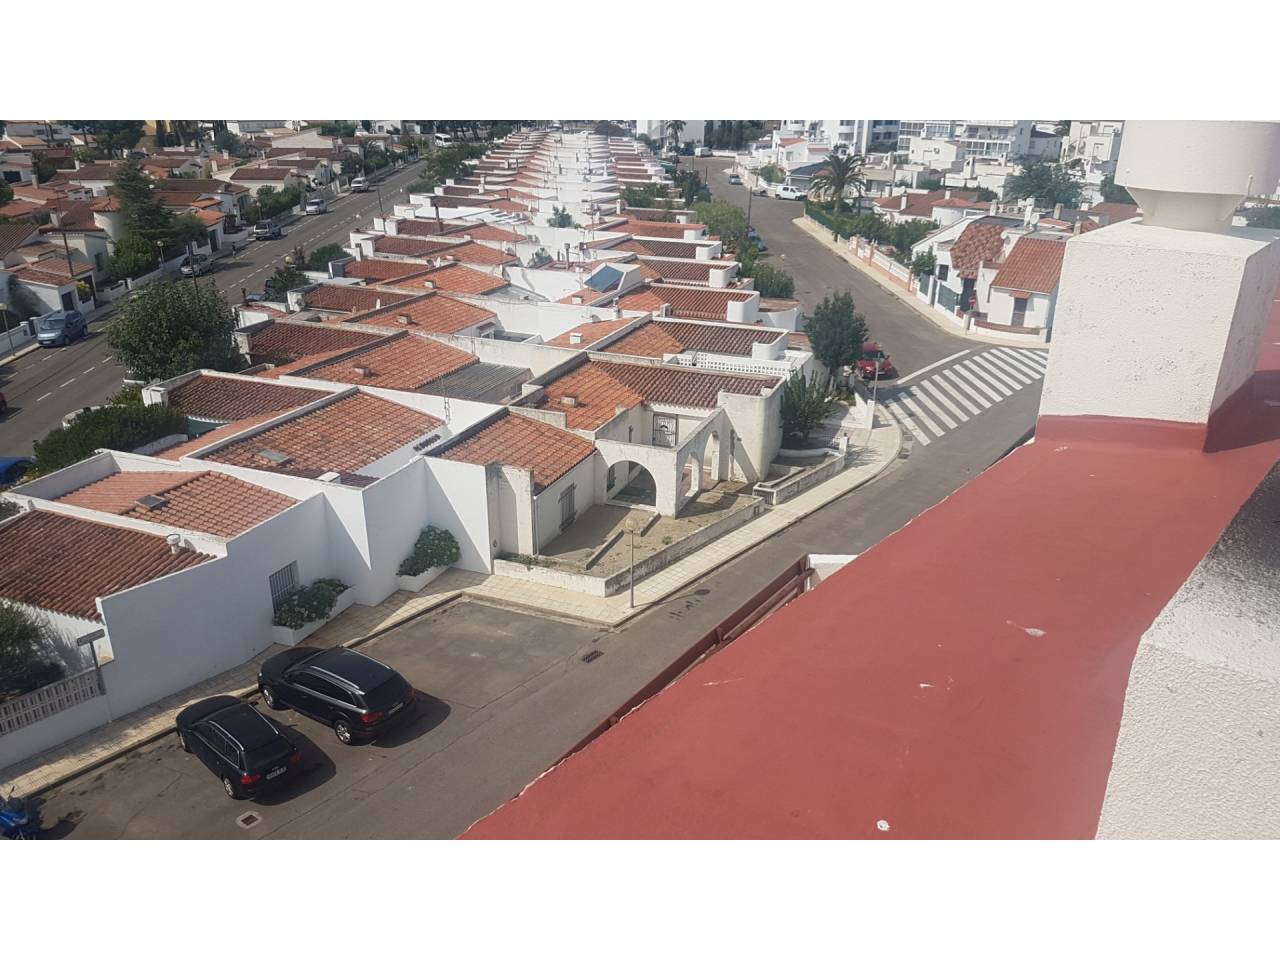 000002 - SANTA MARGARIDA House with garden to reform